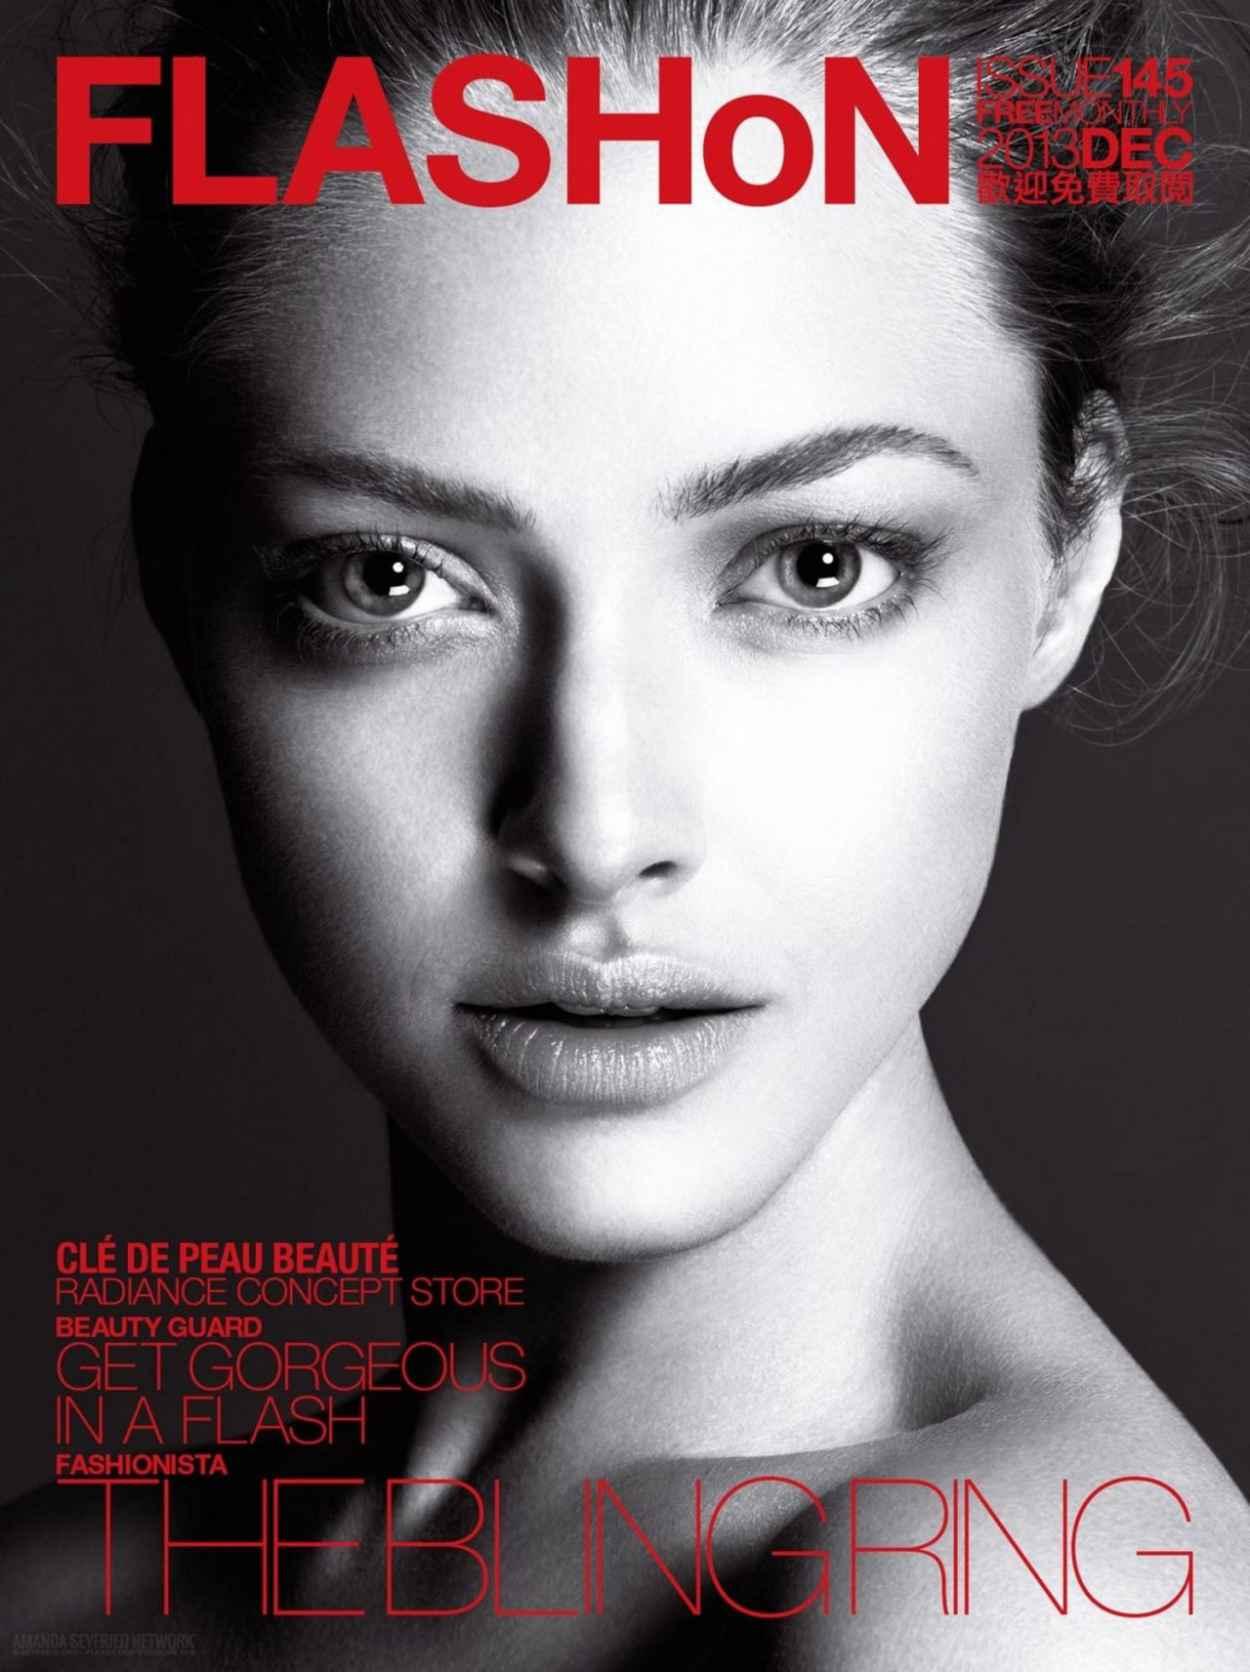 Amanda Seyfried - FLASHON Magazine - December 2015 Issue-1